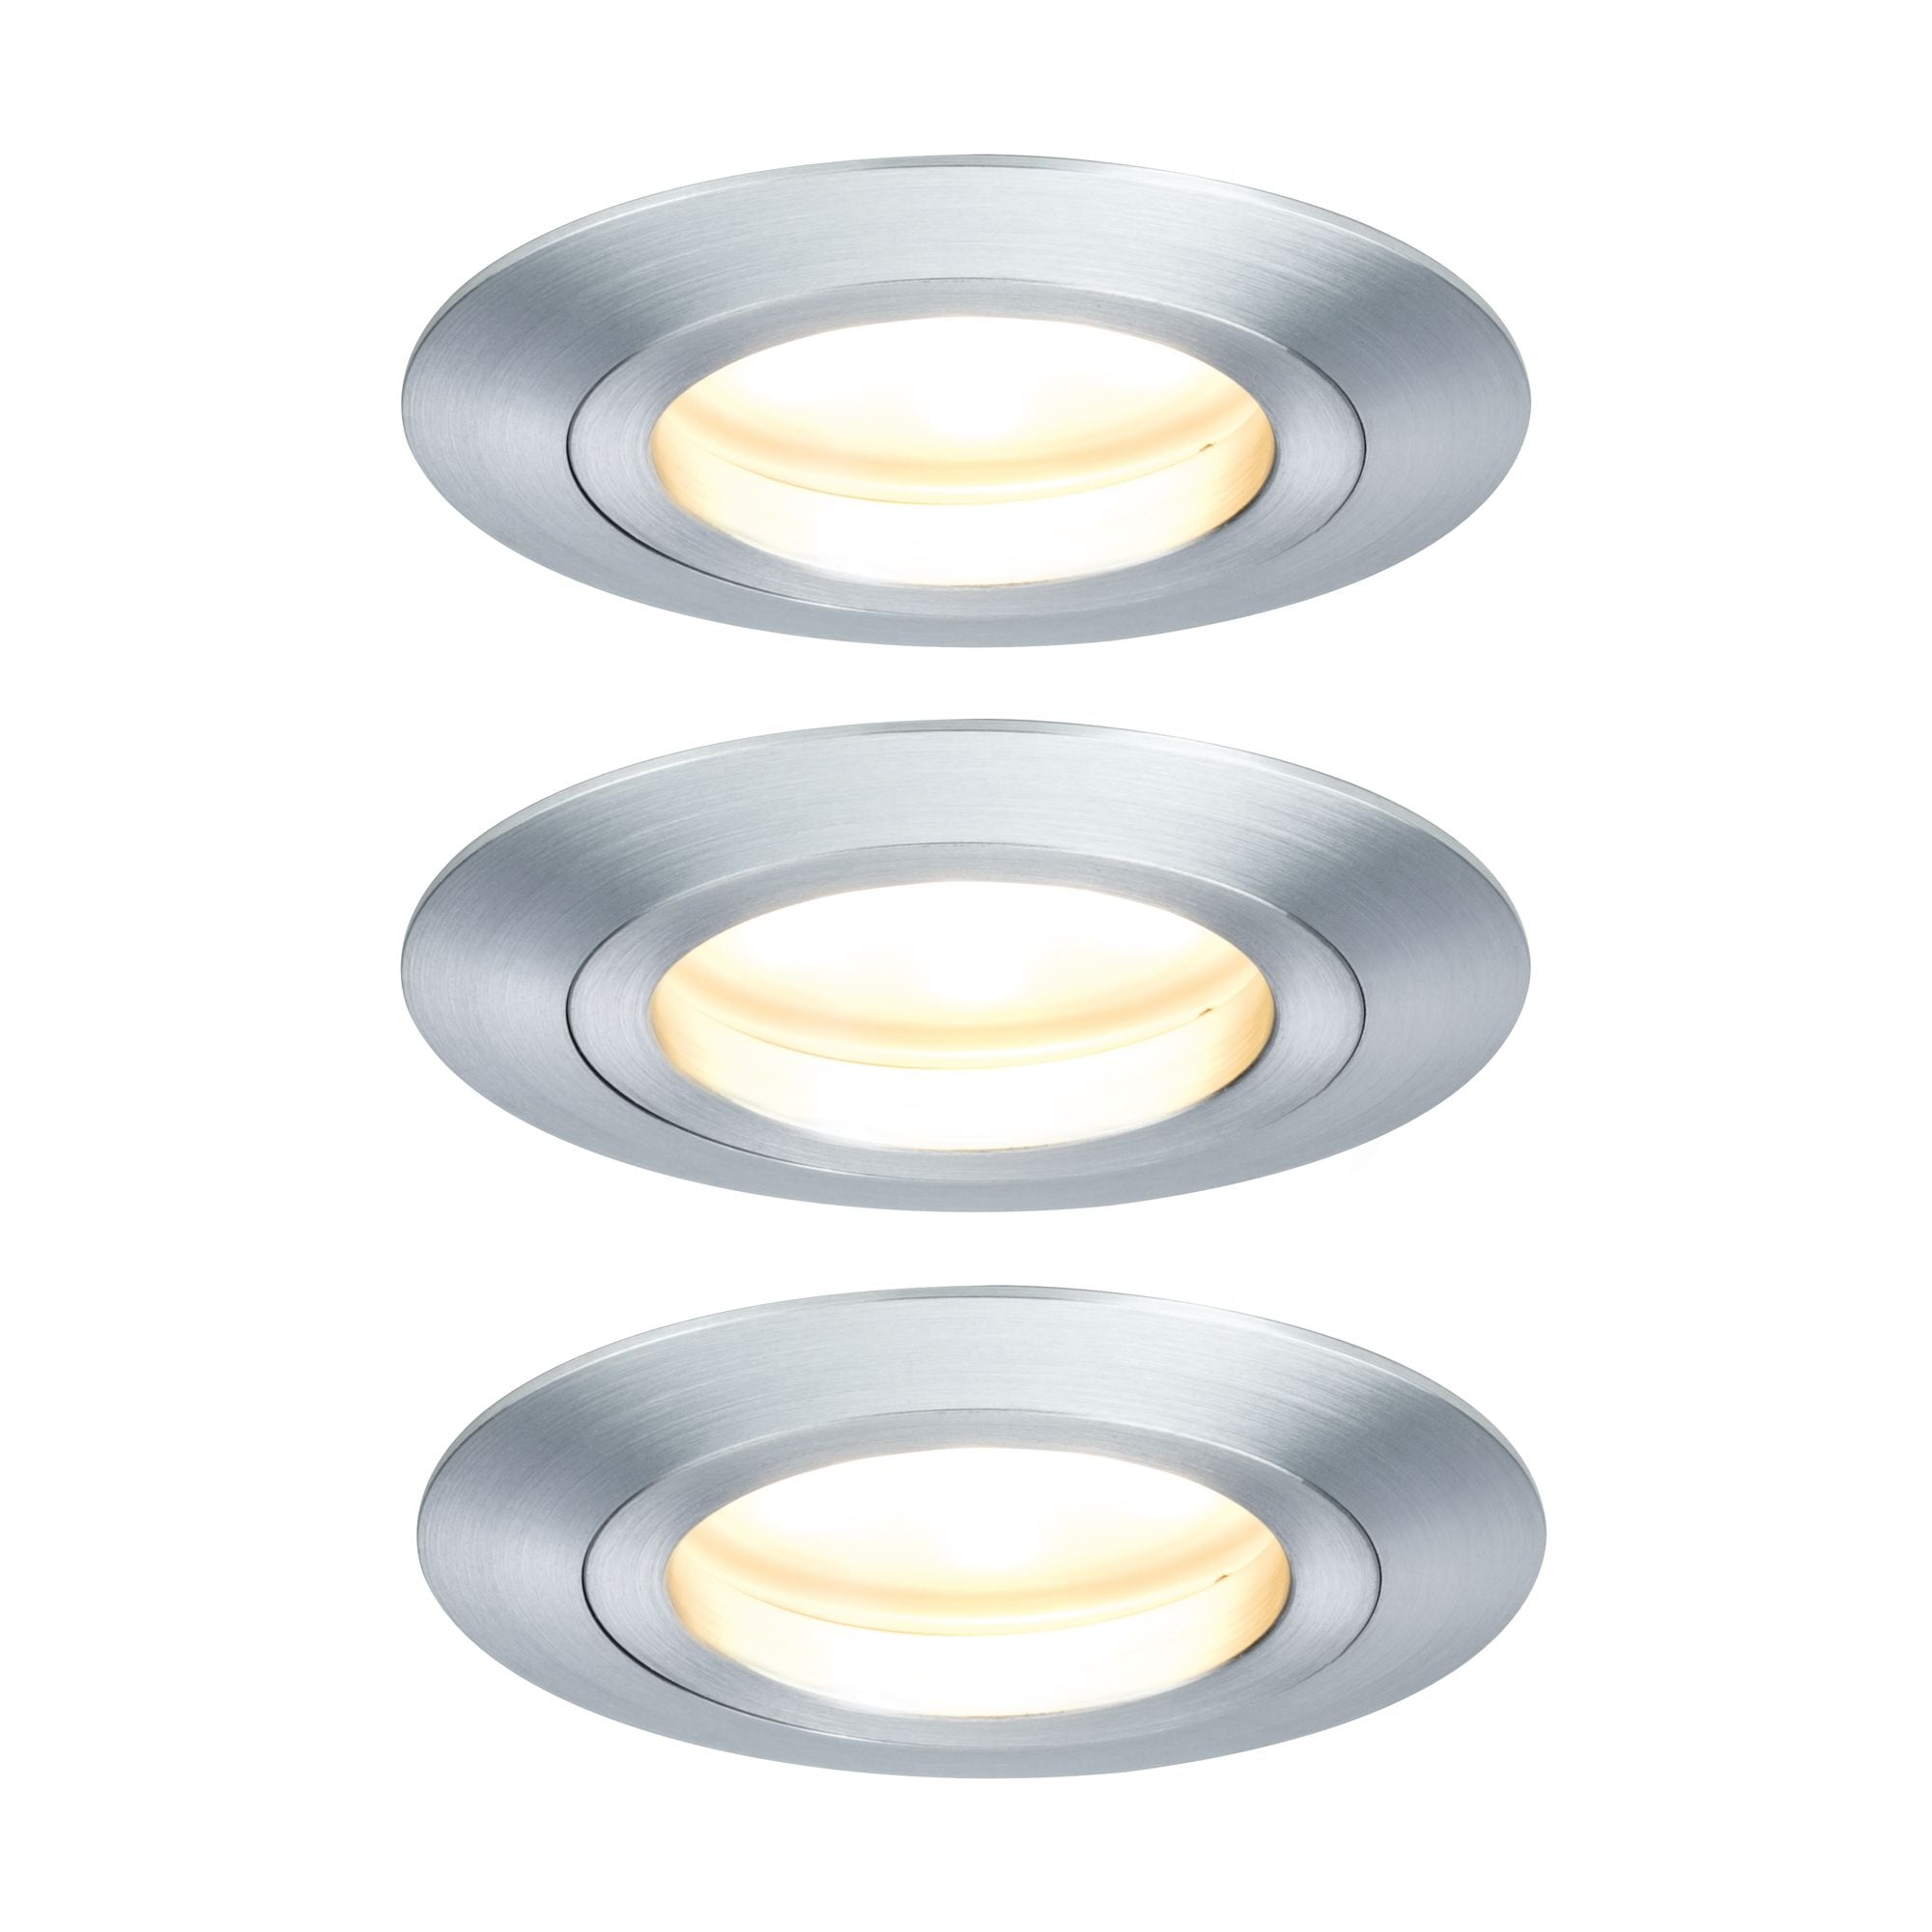 Paulmann LED Einbaustrahler 3er-Set dimmbar Silberfarben rund 7W Alu, 3 St., Warmweiß